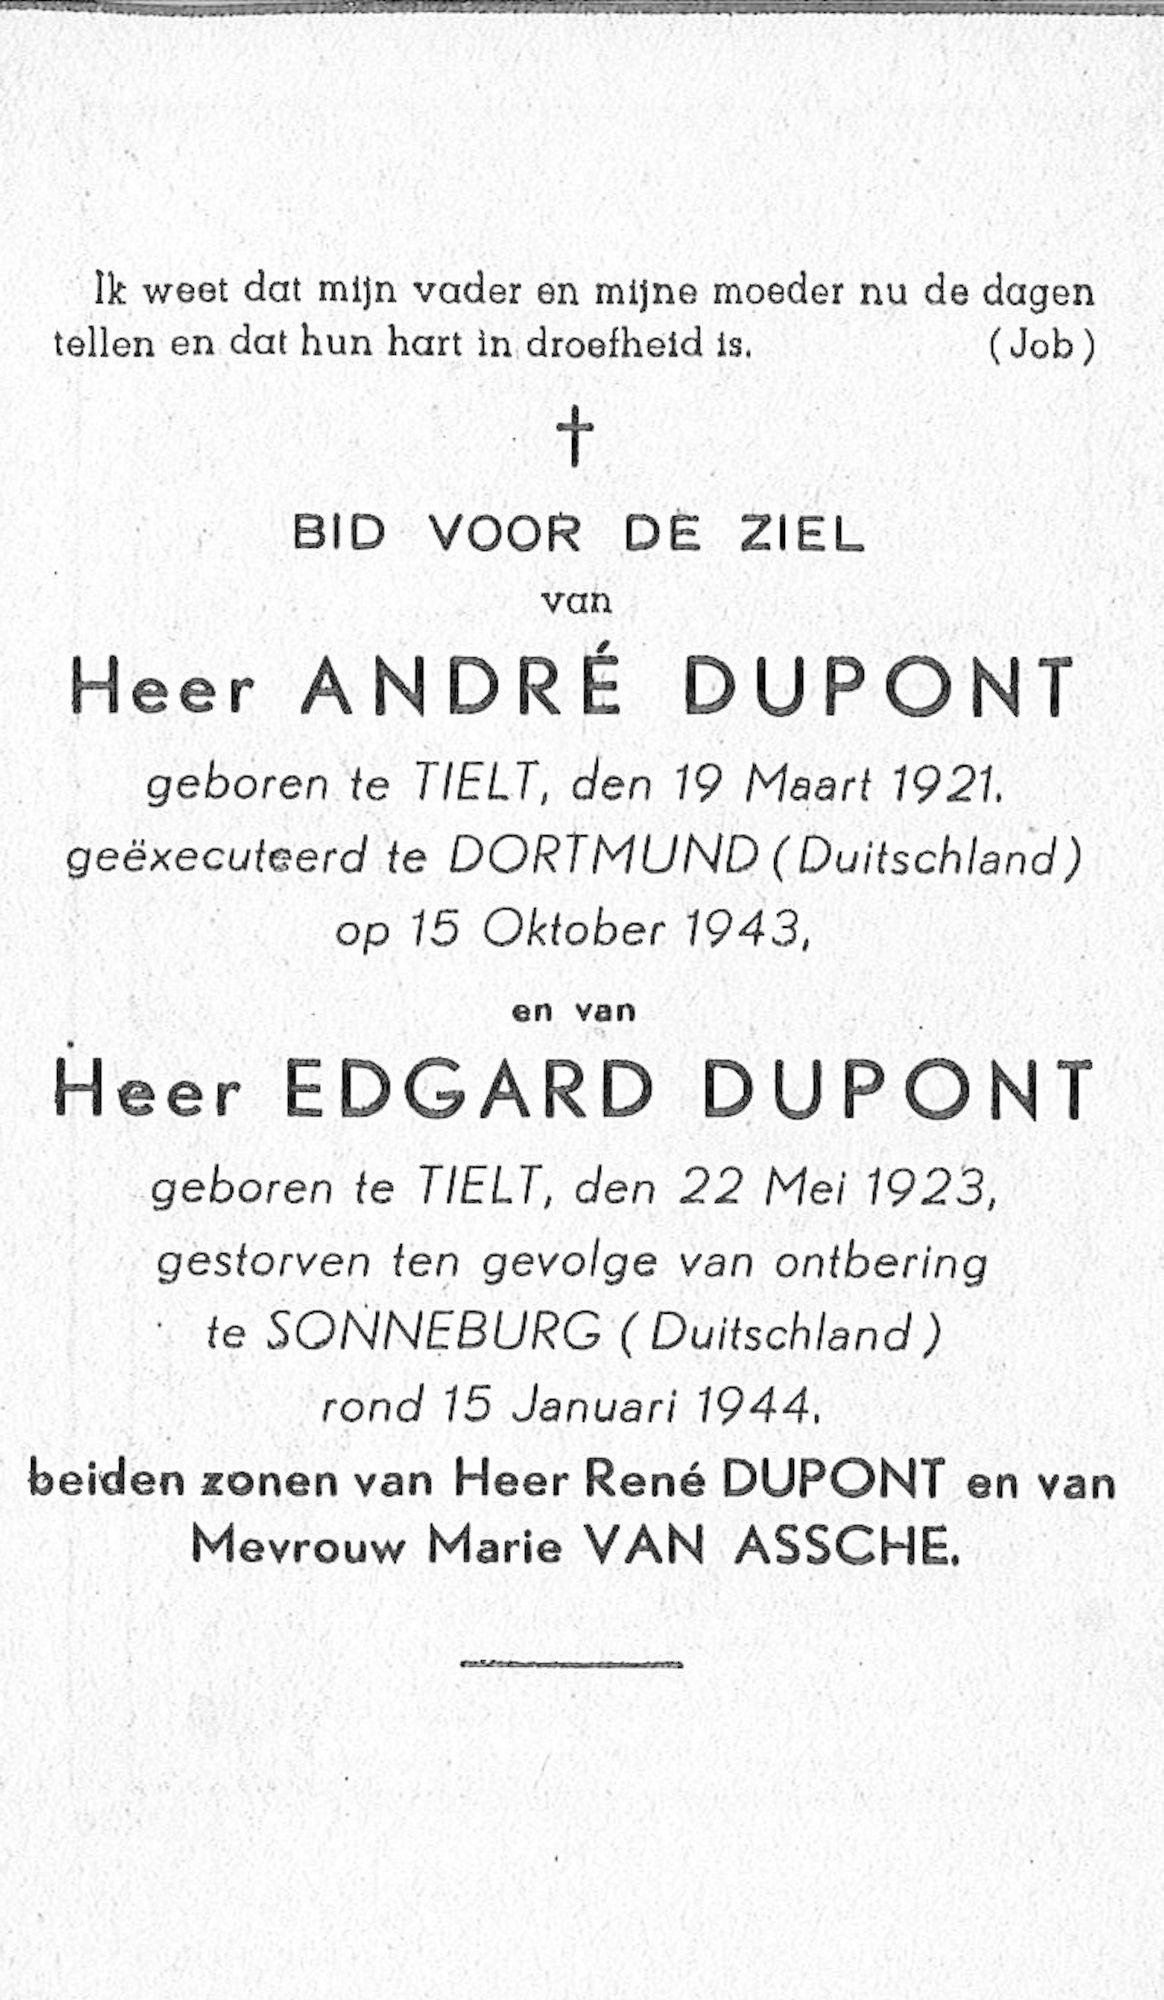 André Dupont